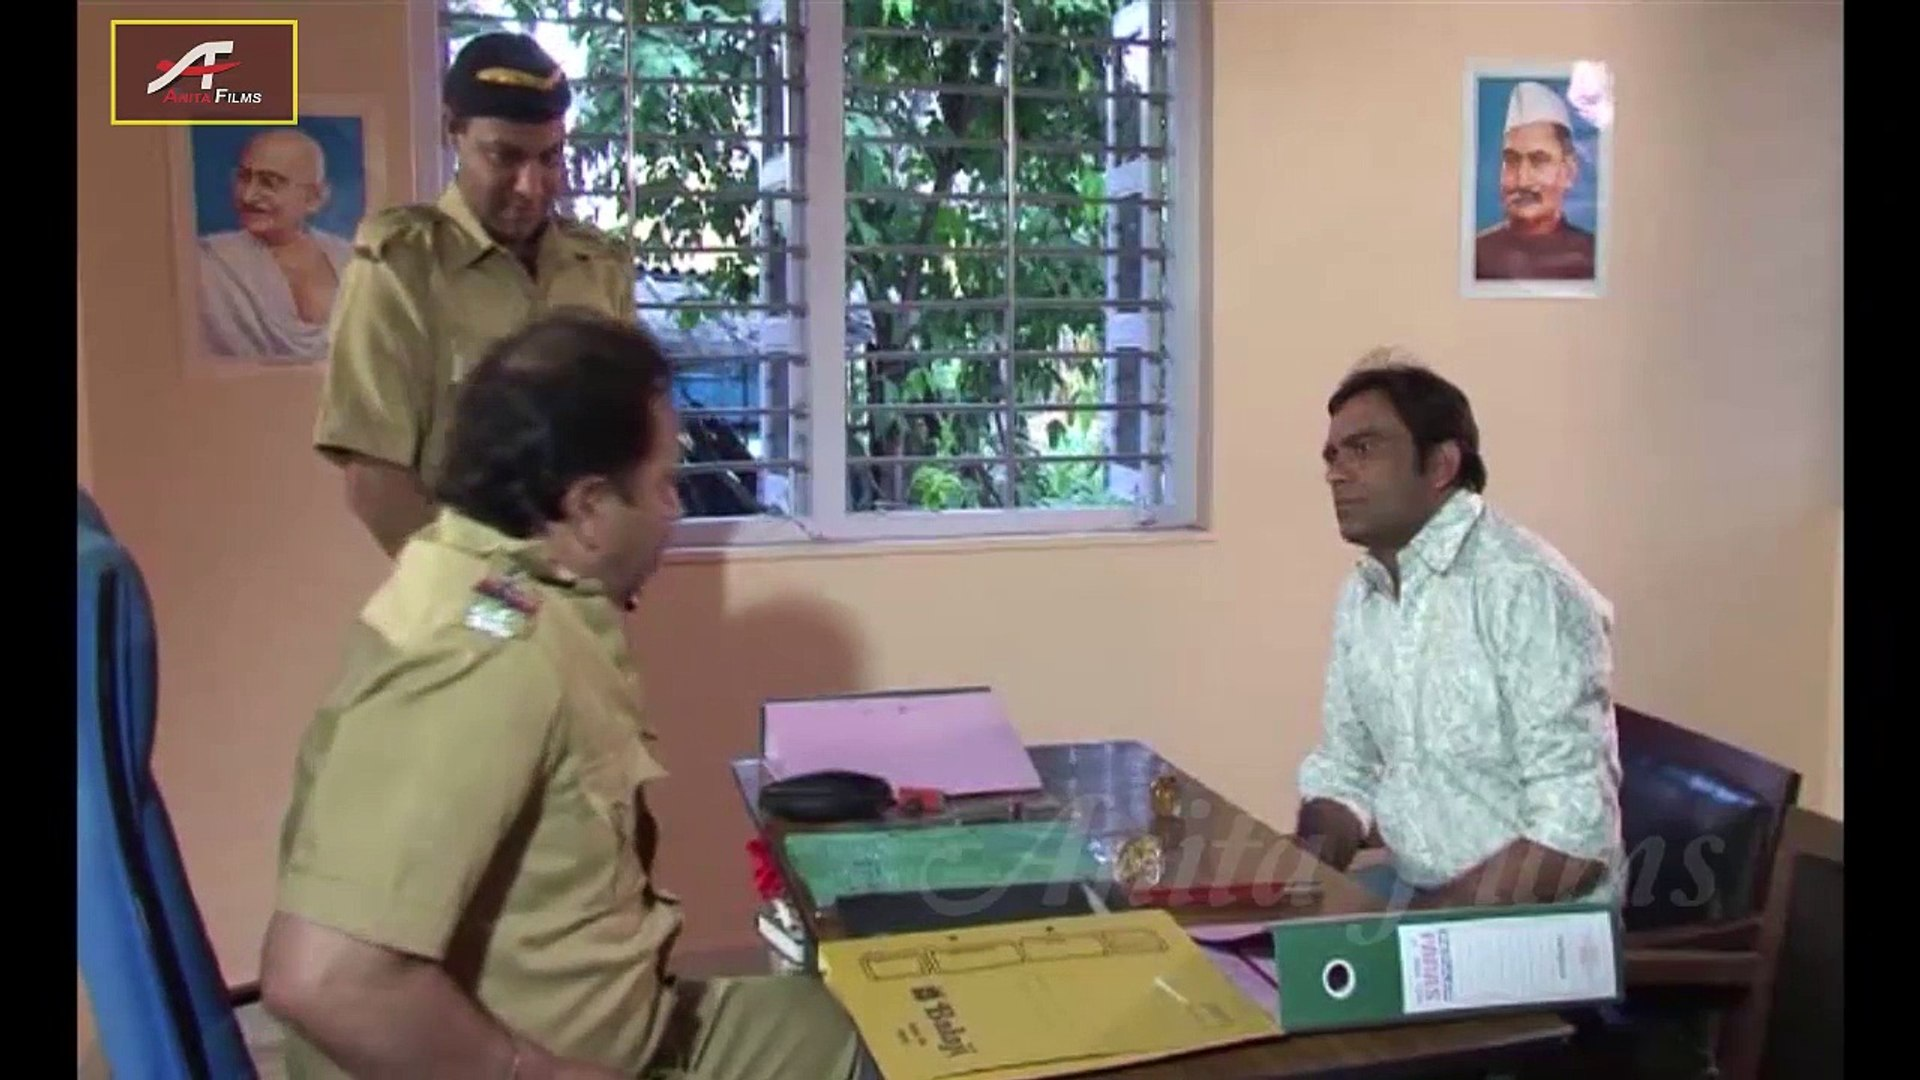 Best Comedy Scenes   Hindi Movie - Rental Ho Gaye Mental - Scene 6   Bollywood Comedy   Indian Funny